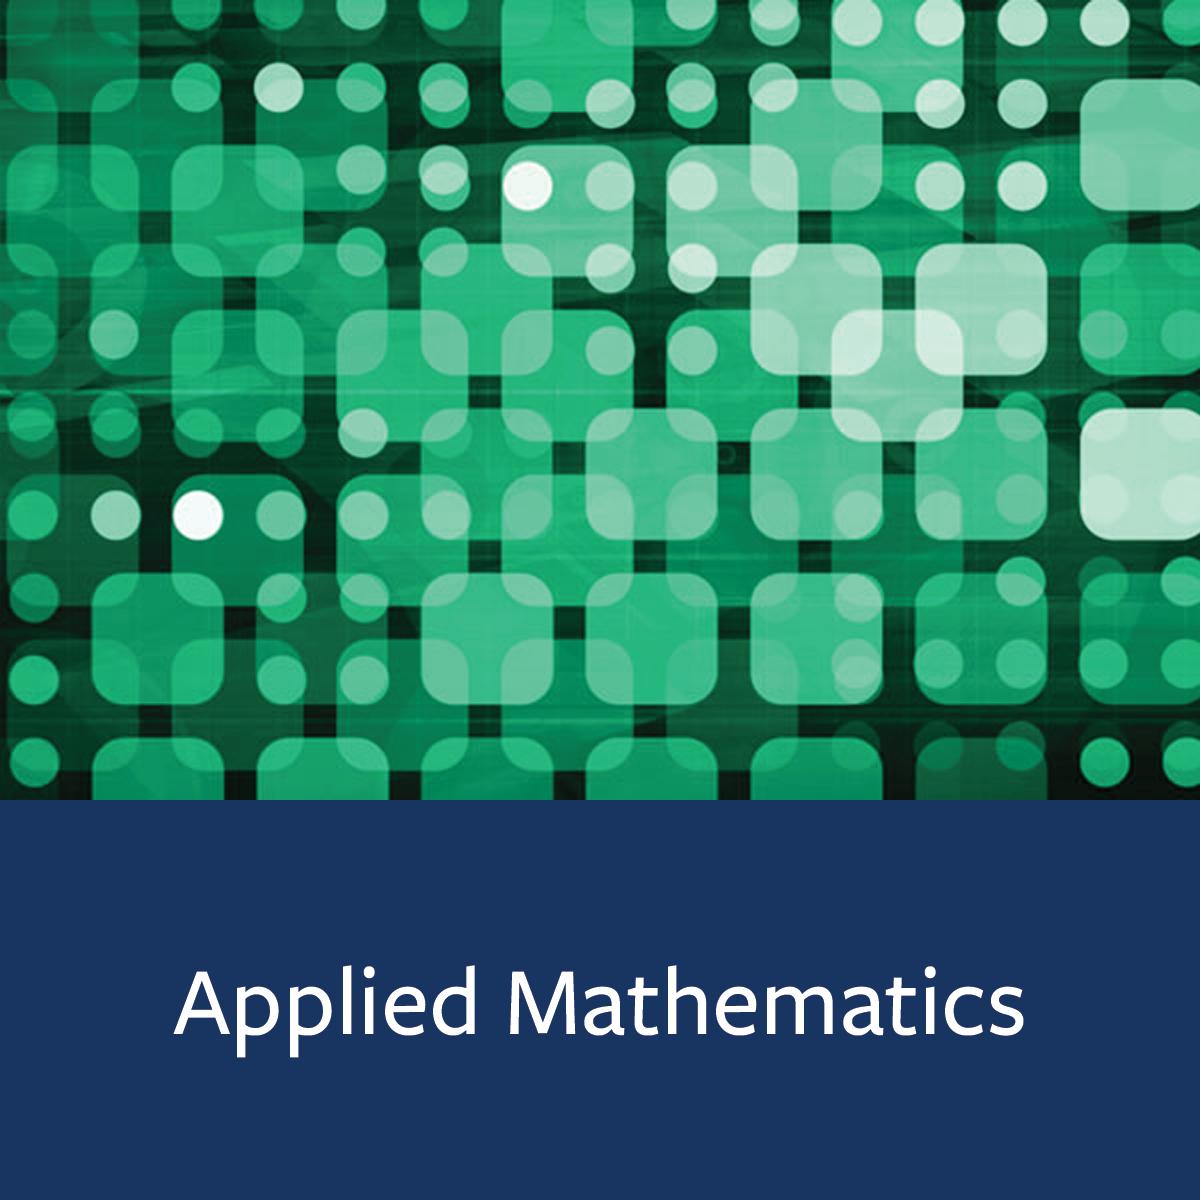 Applied Mathematics Major Map